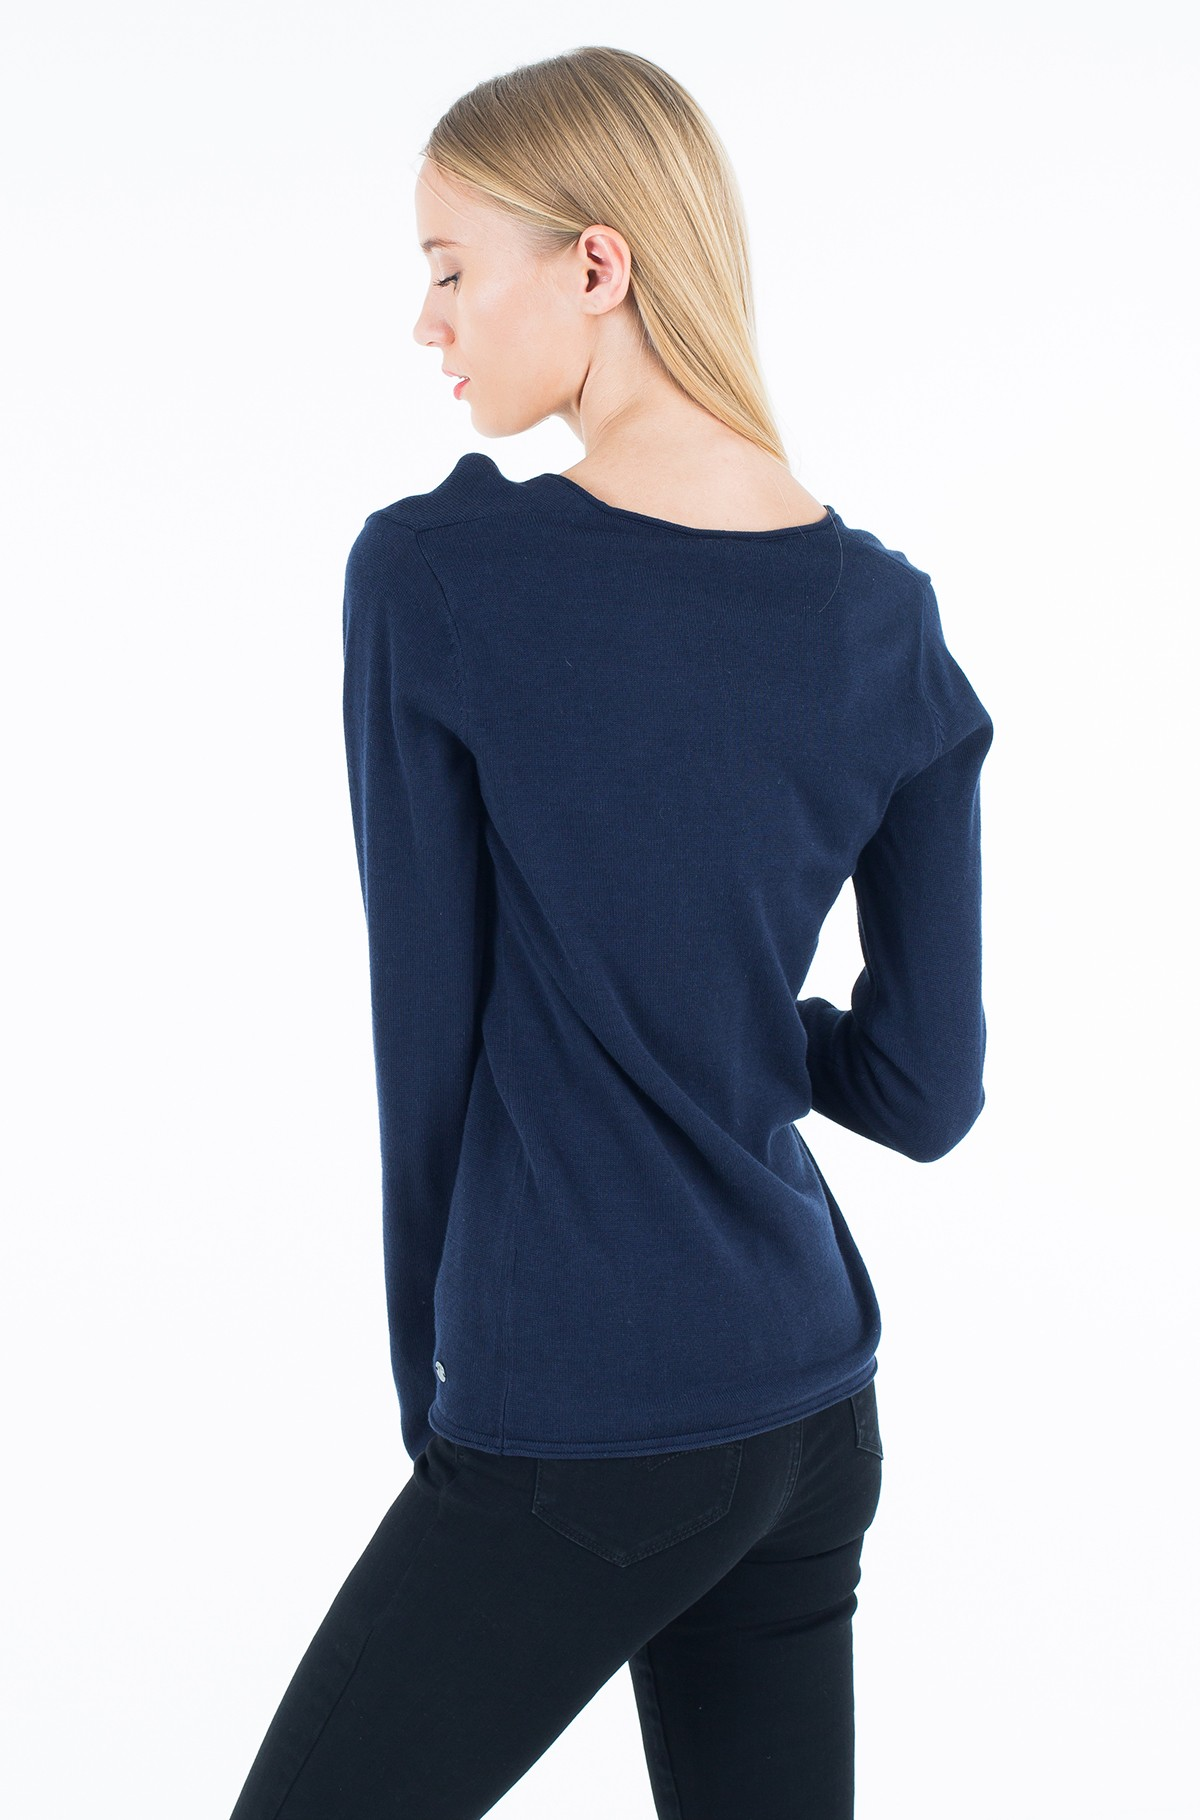 Sweater 3021854.09.70-full-2